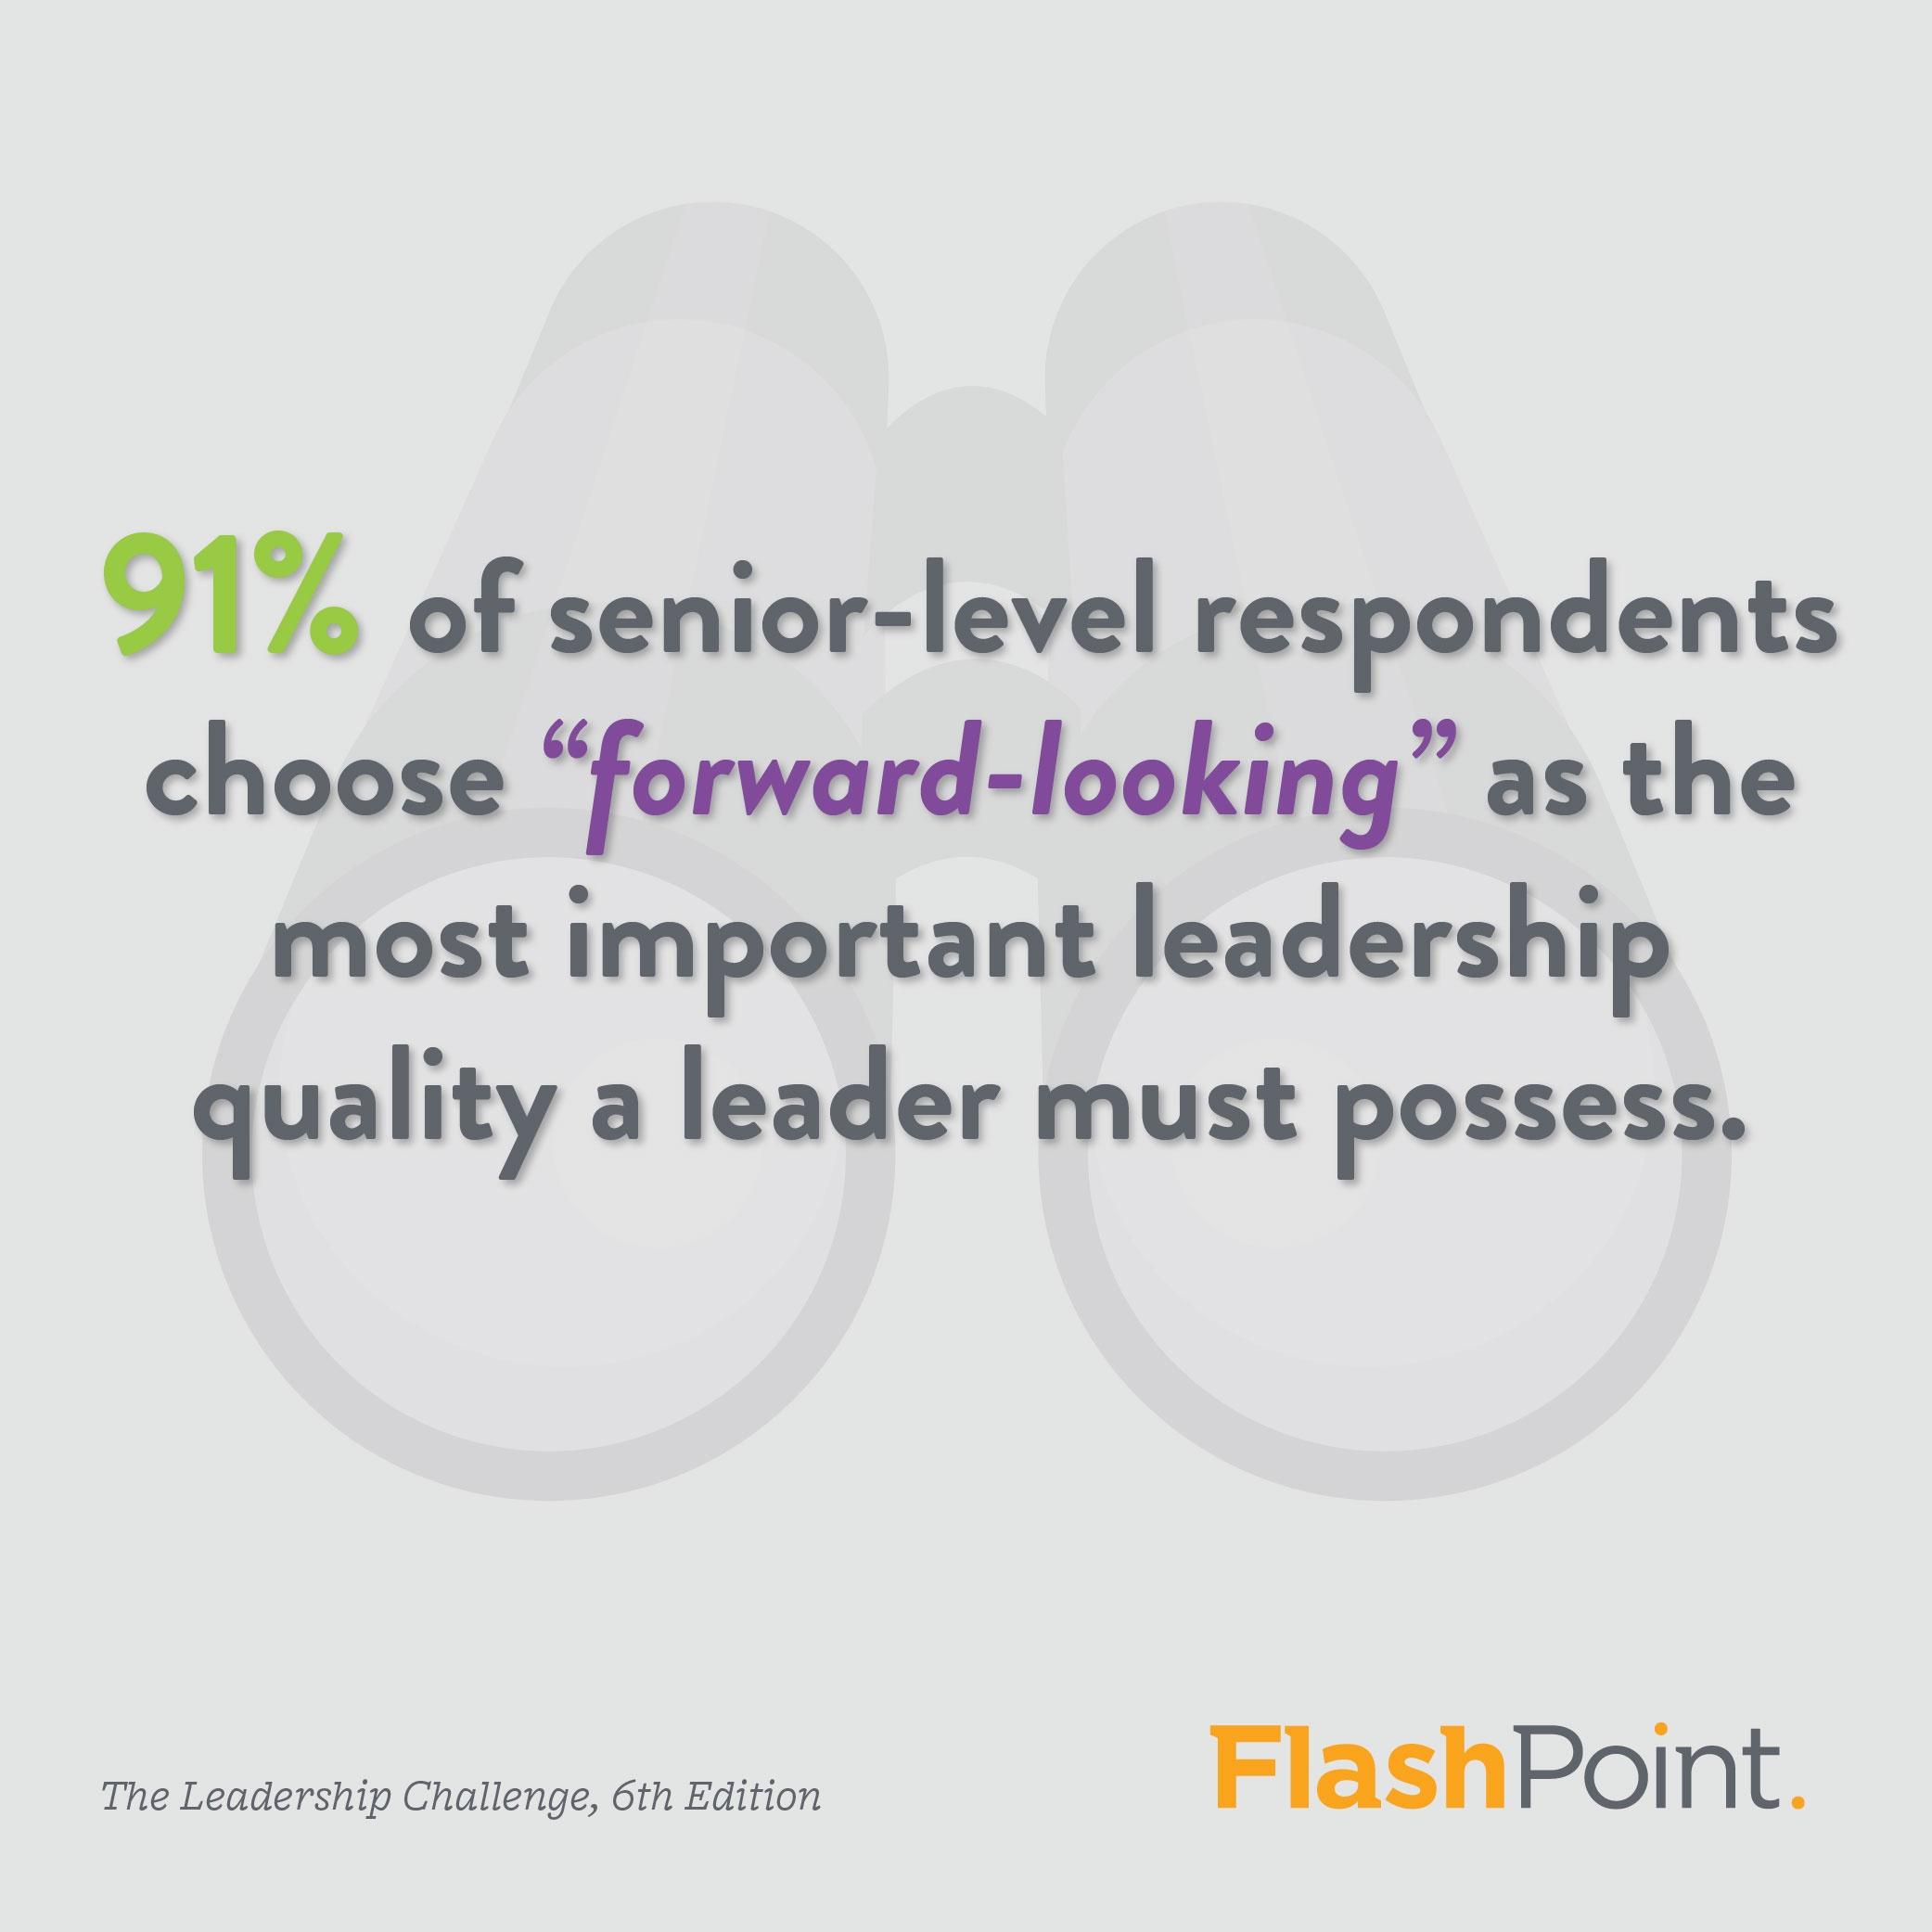 Forward-looking leadership is critical skill for organizational success